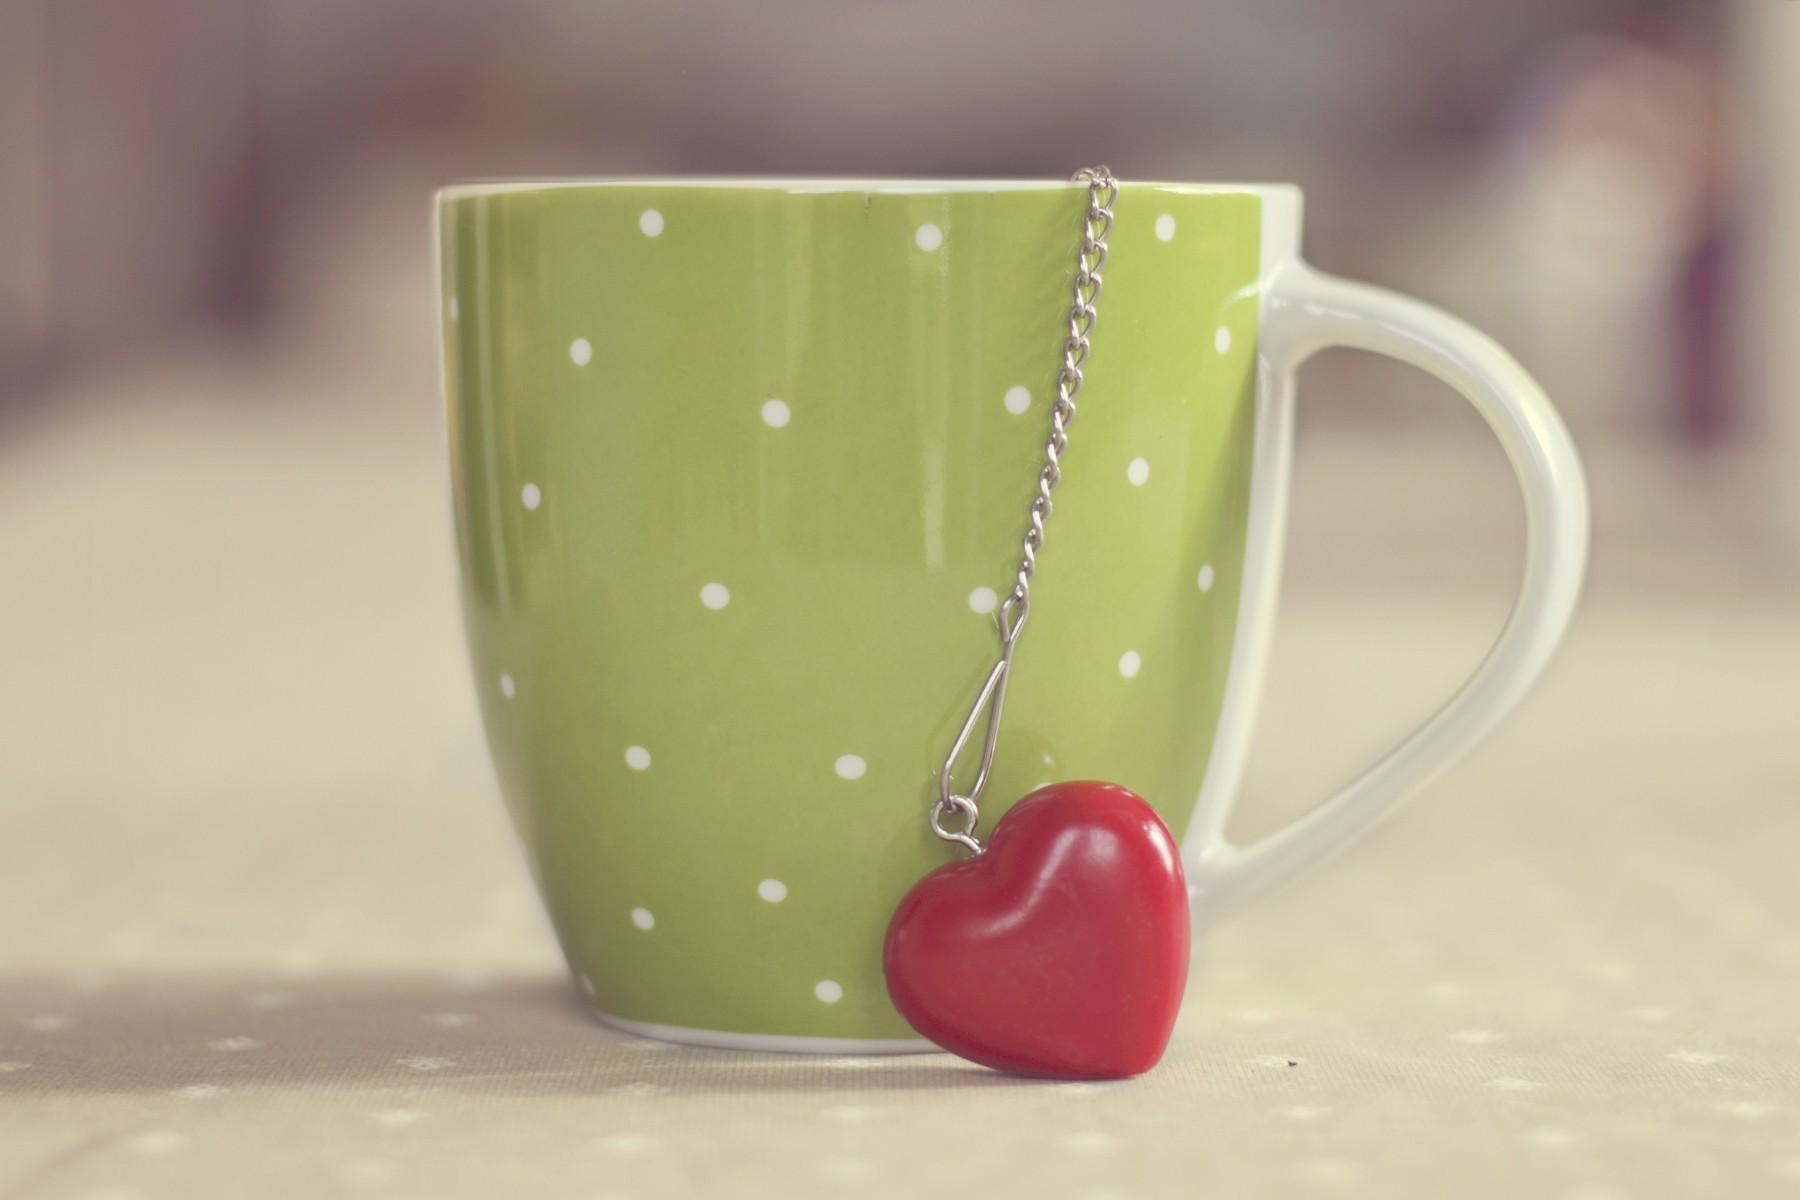 Tea coffee mug wallpaper 8135 PC en 1800x1200